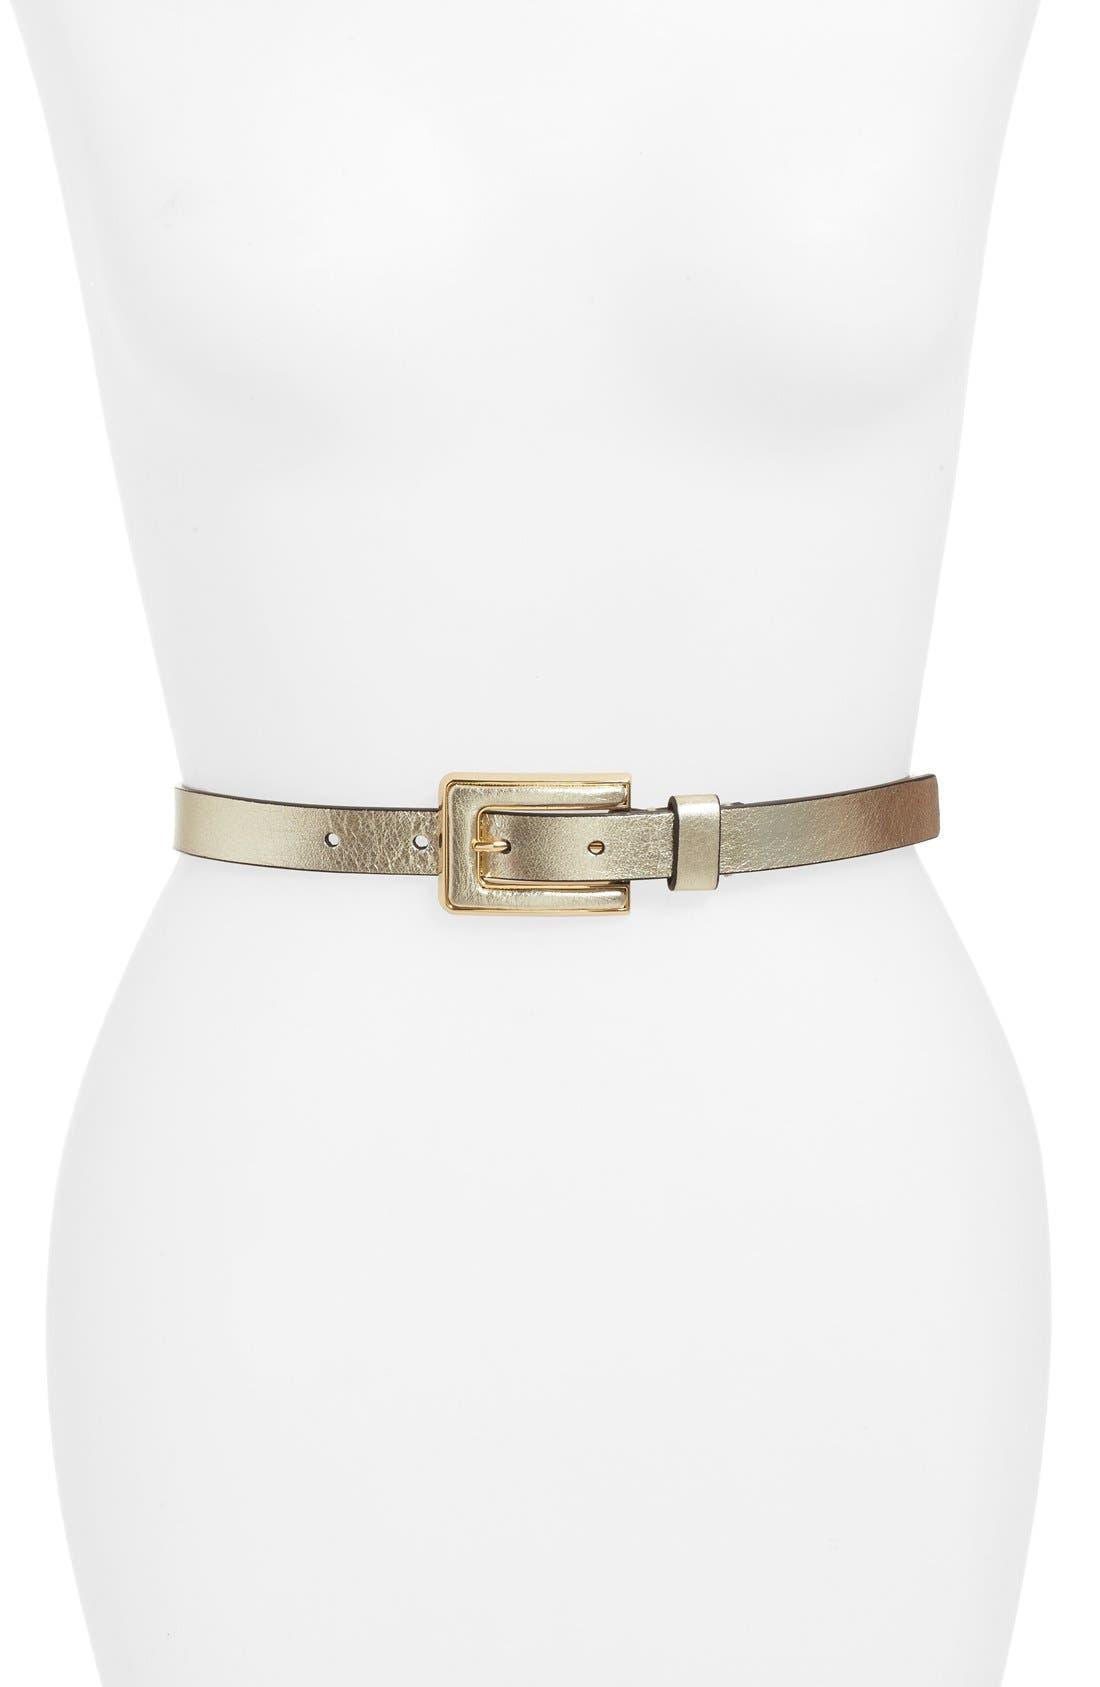 KATE SPADE NEW YORK, metallic leather belt, Main thumbnail 1, color, 710